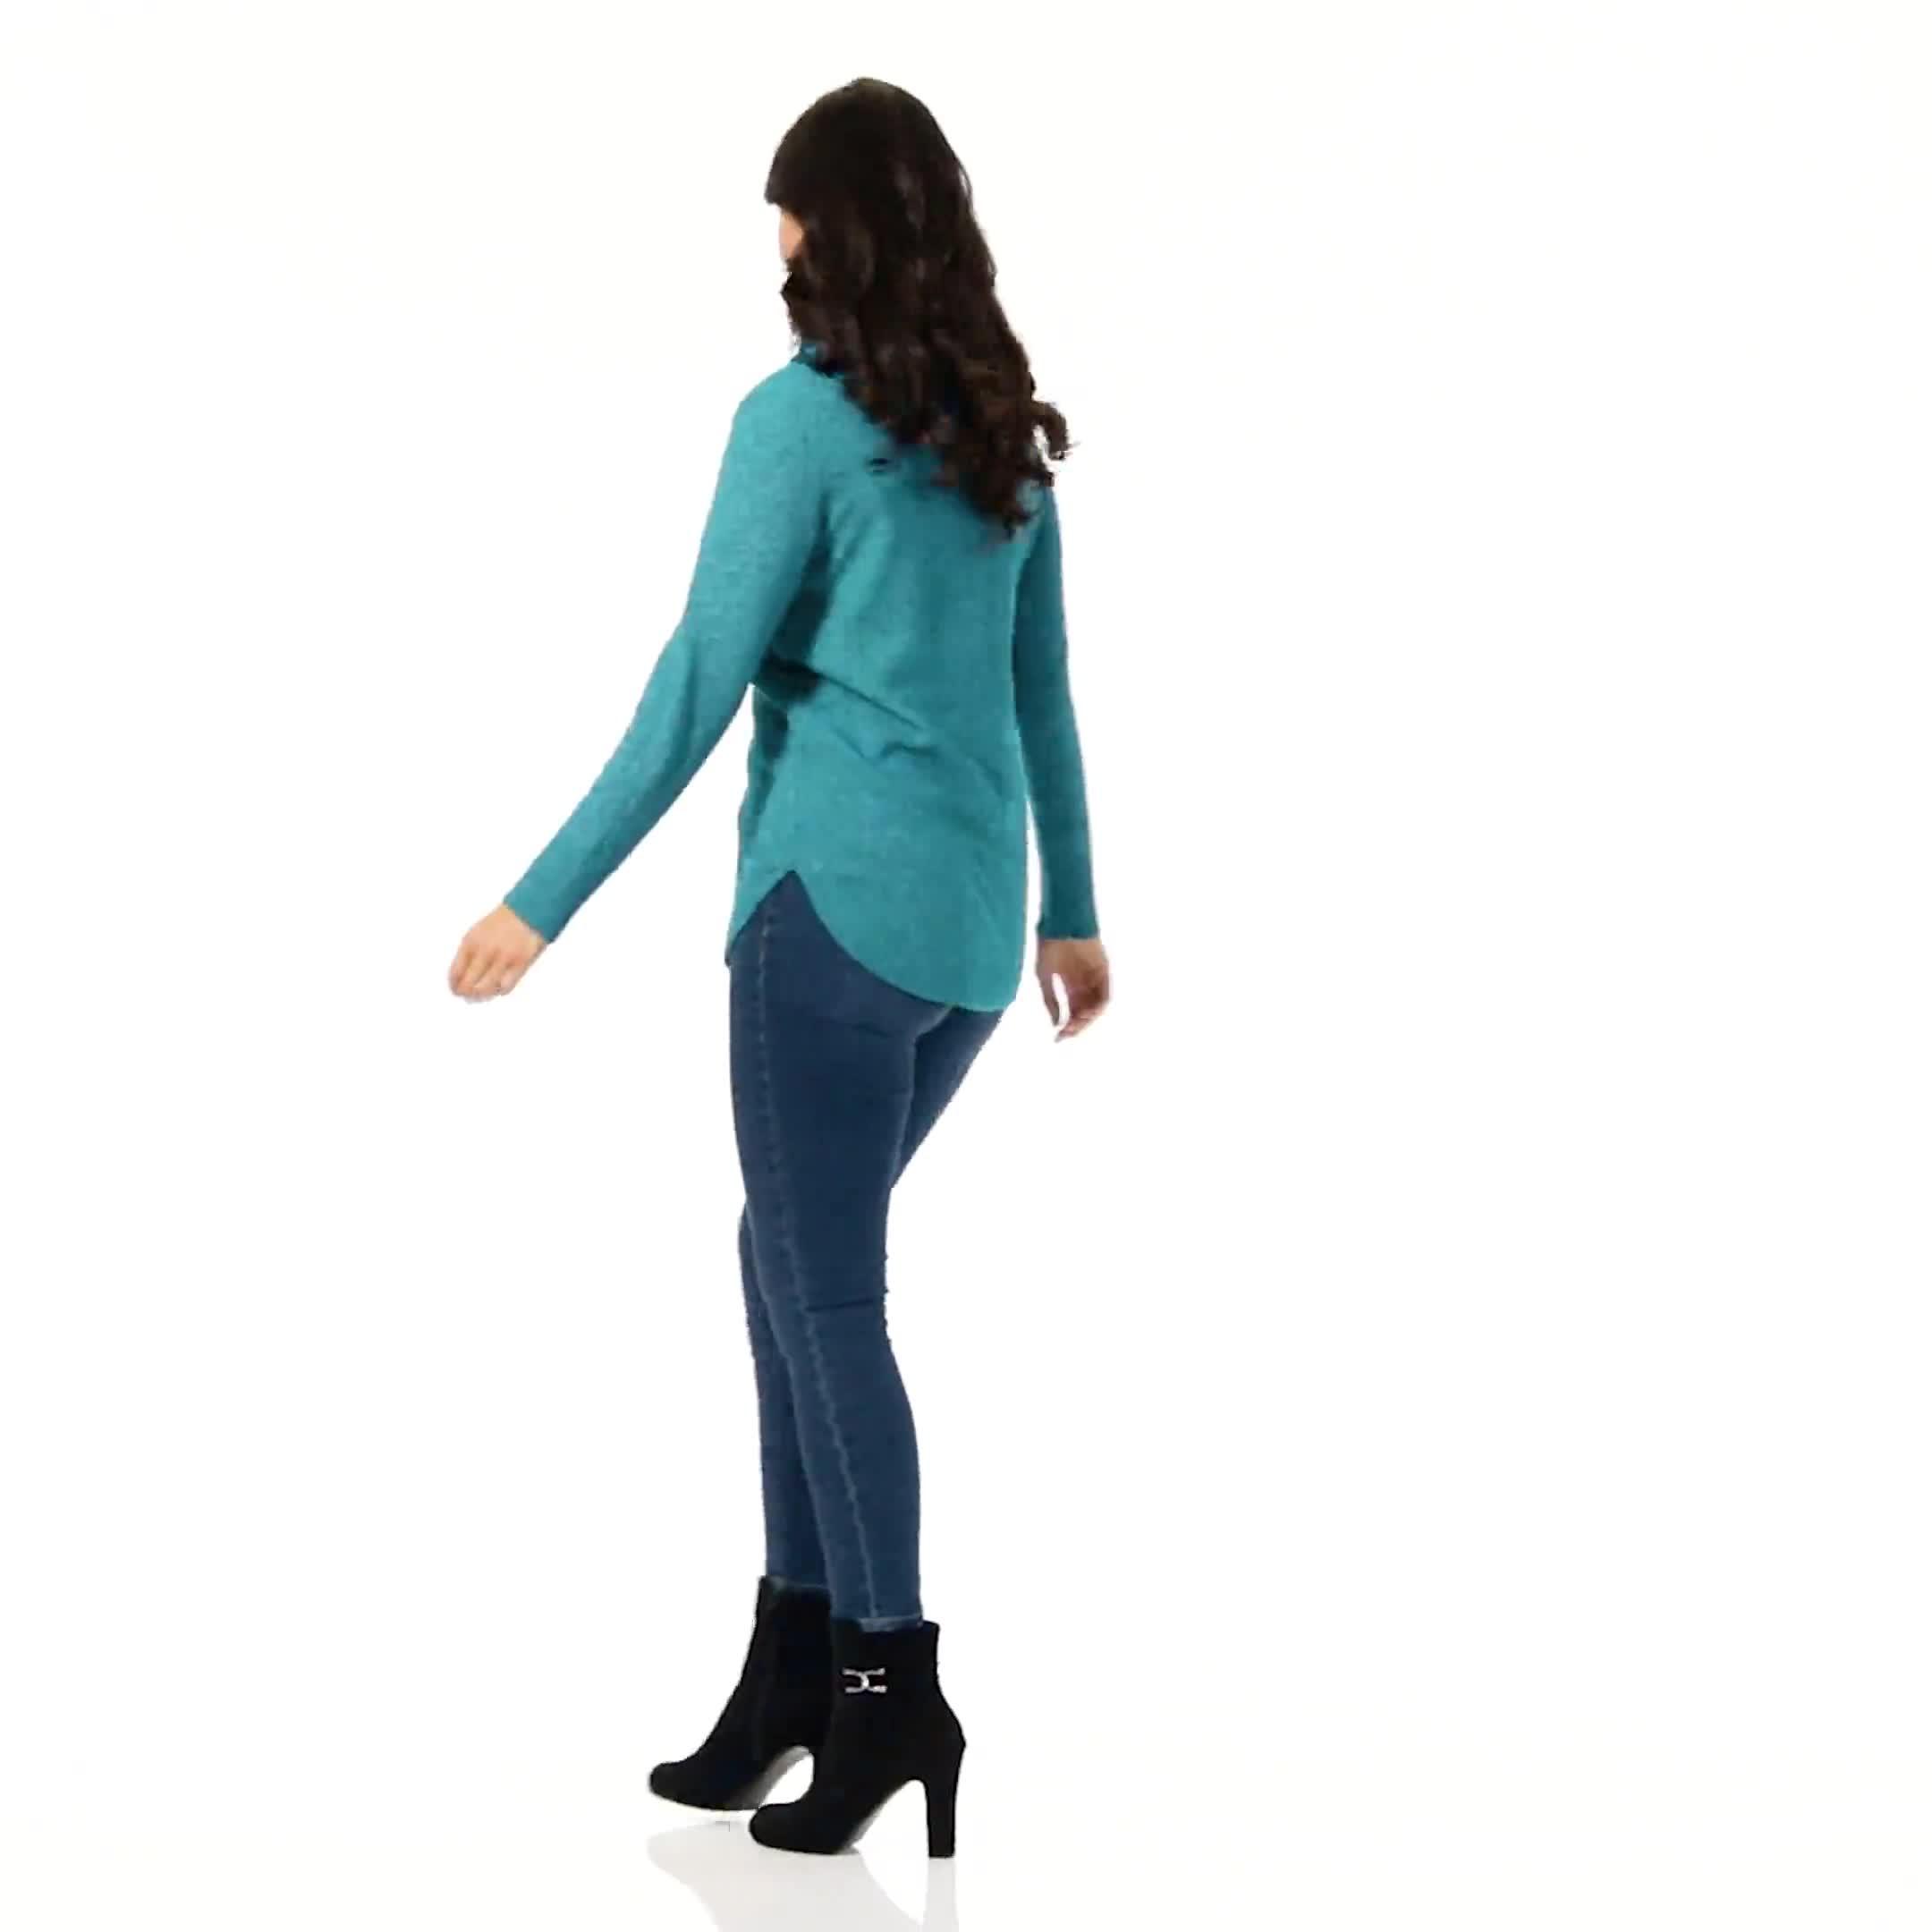 Westport Cowl Neck Curved Hem Sweater - Video